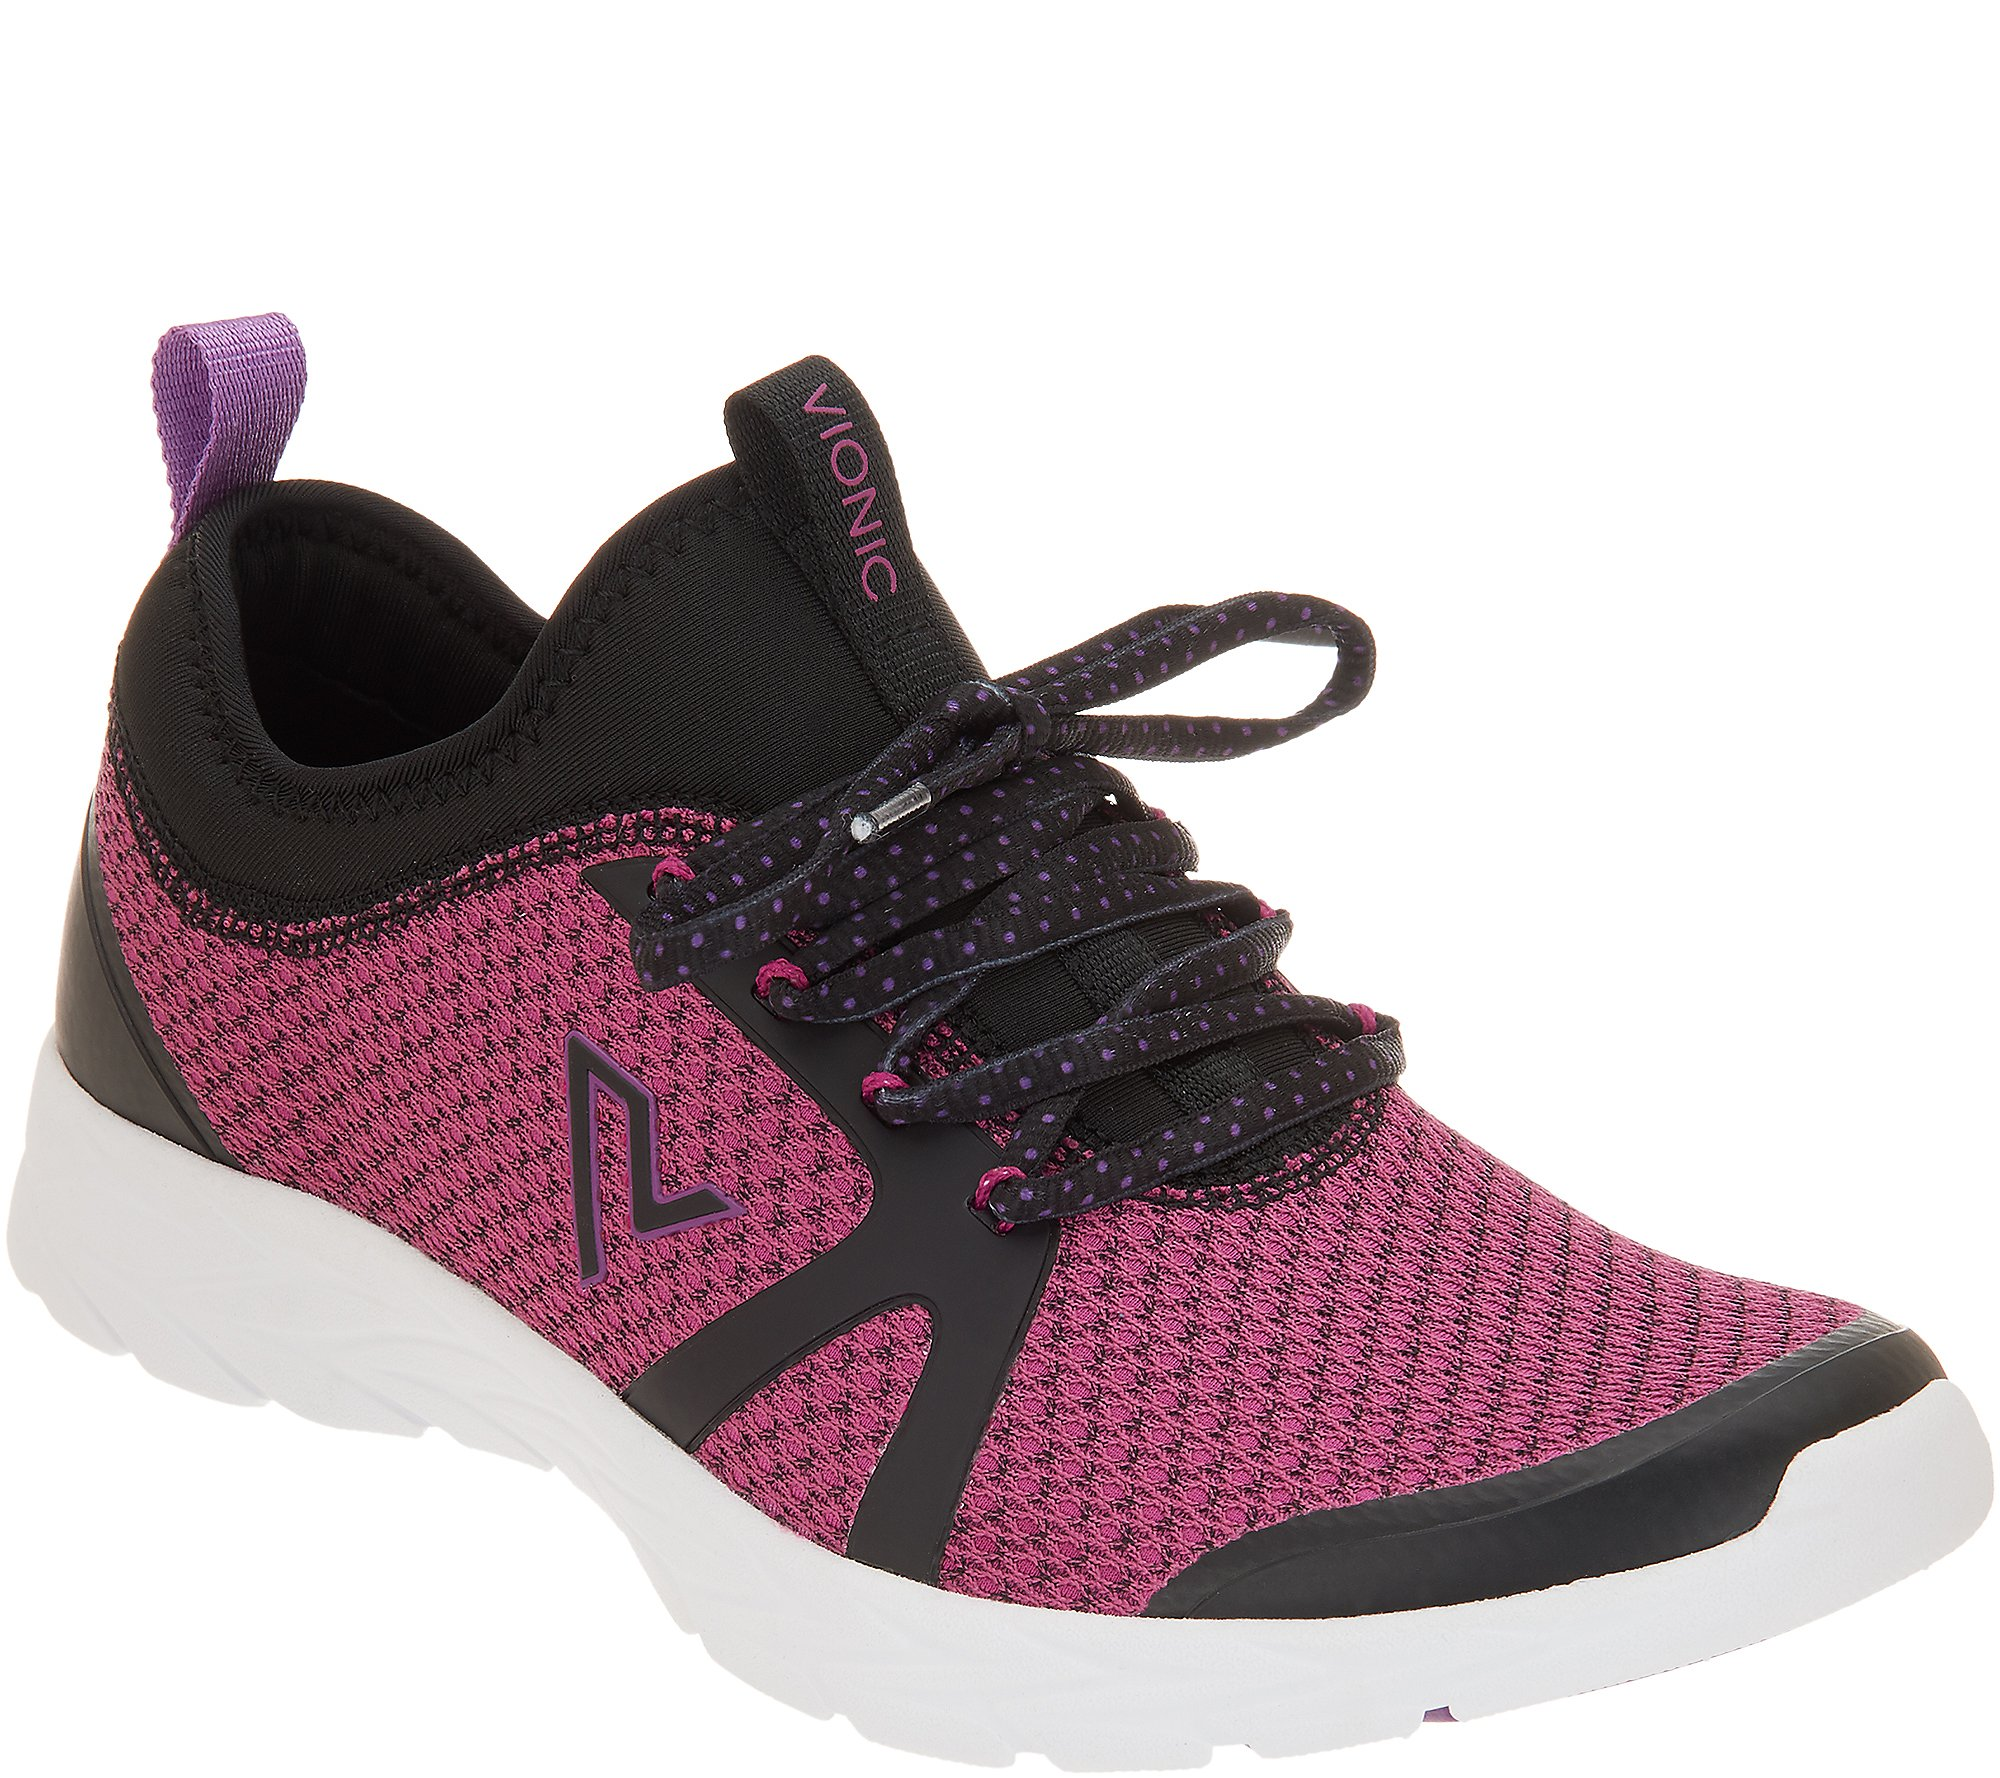 Vionic Mesh Lace-Up Women's Sneakers